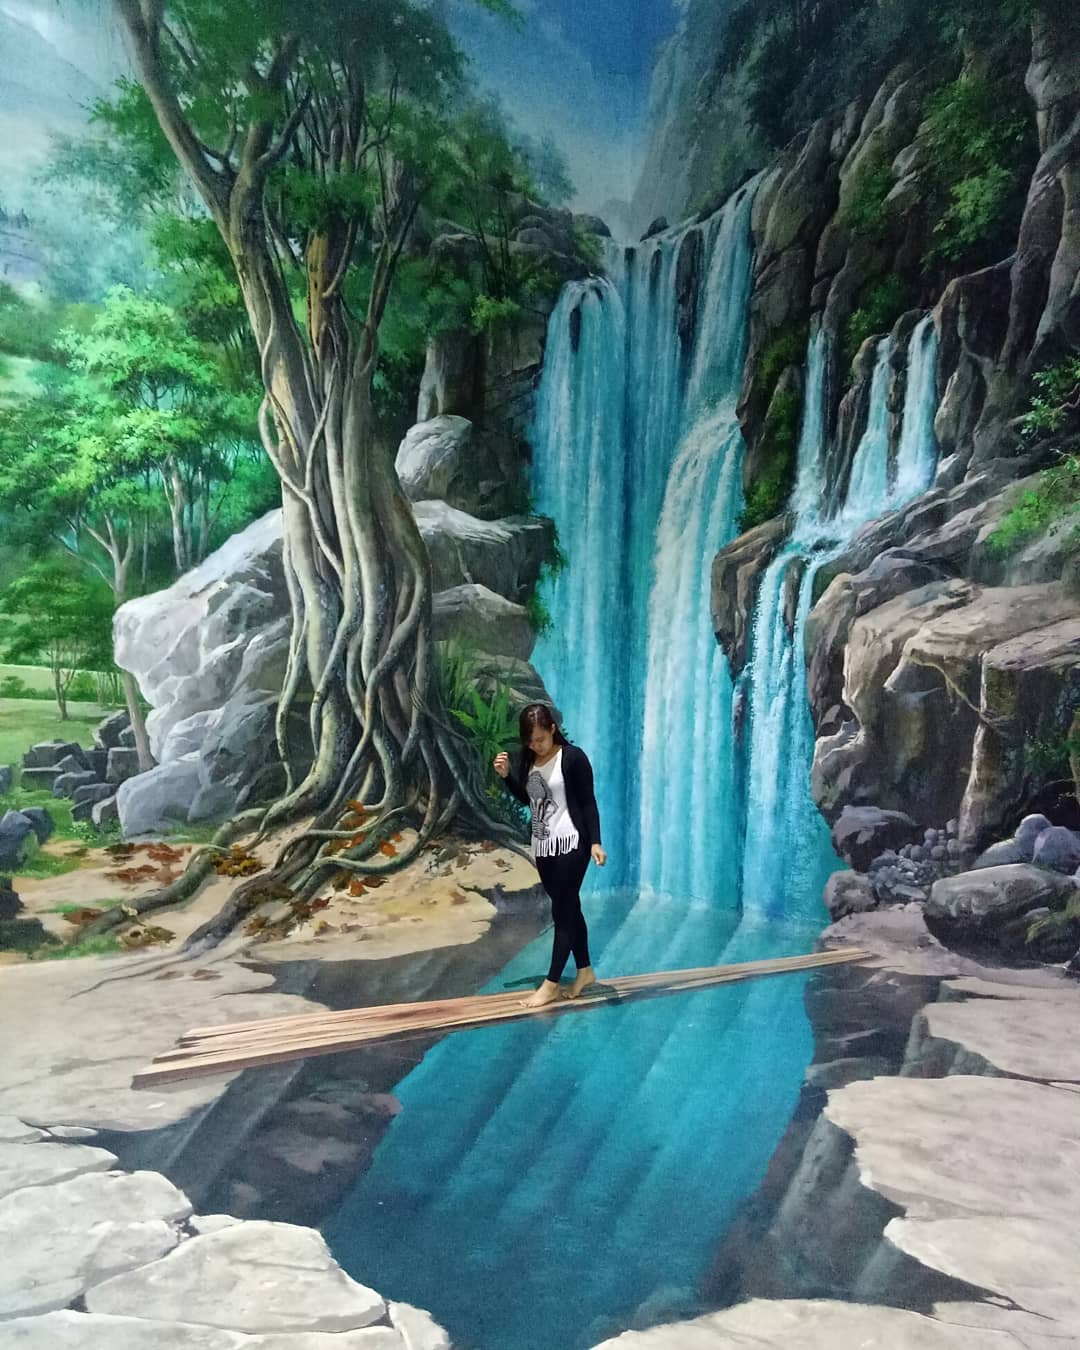 Trick Art 3D Gallery is located not far from Seminyak Beach Bali